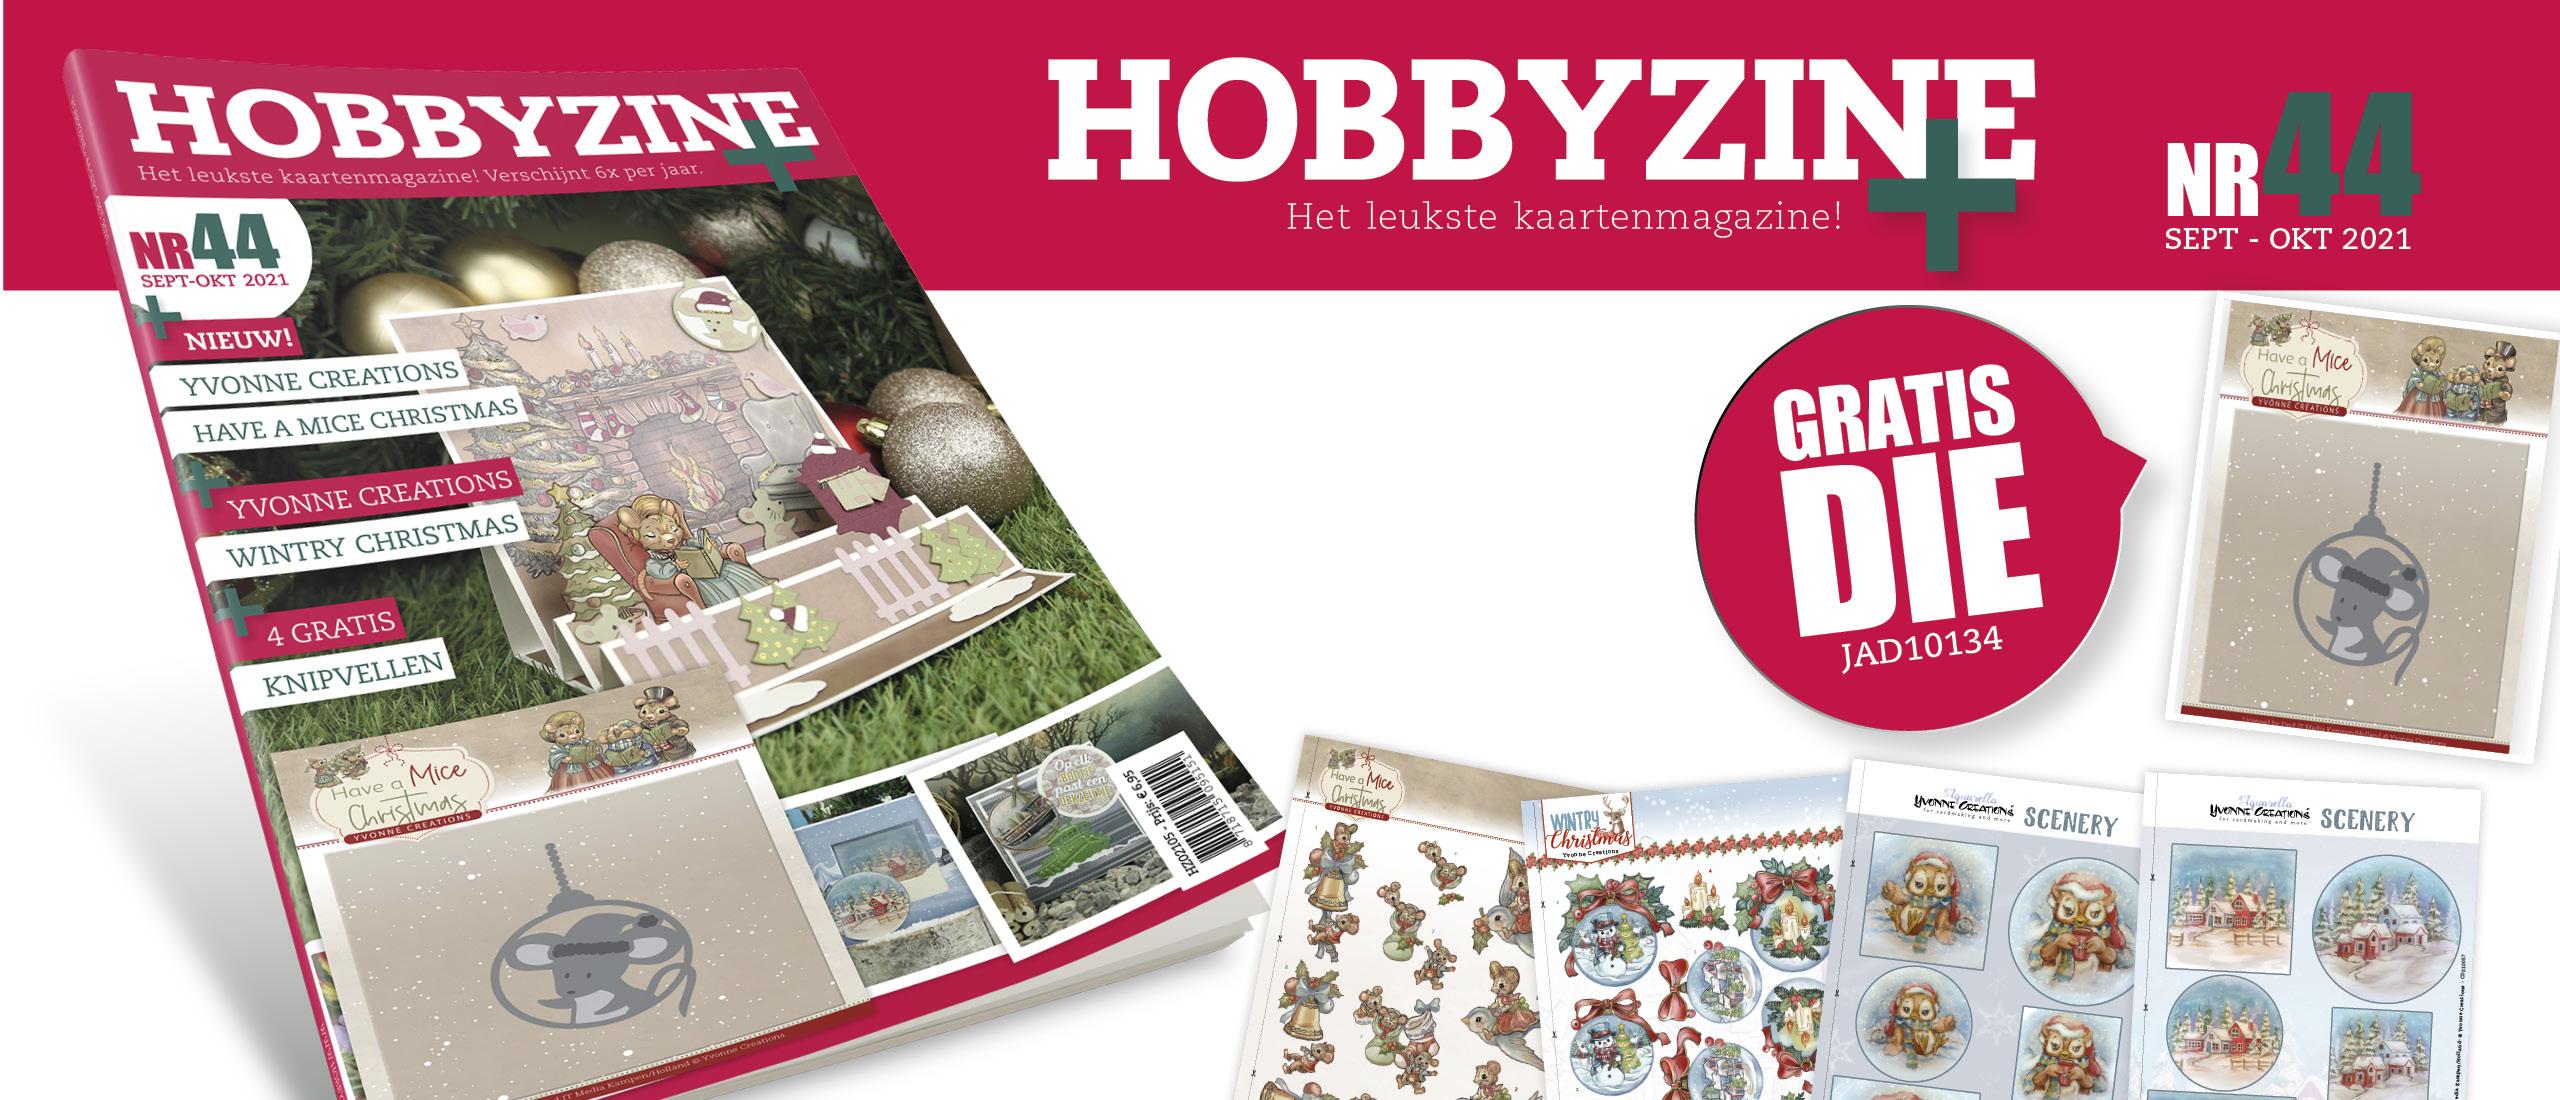 Hobbyzine plus 44